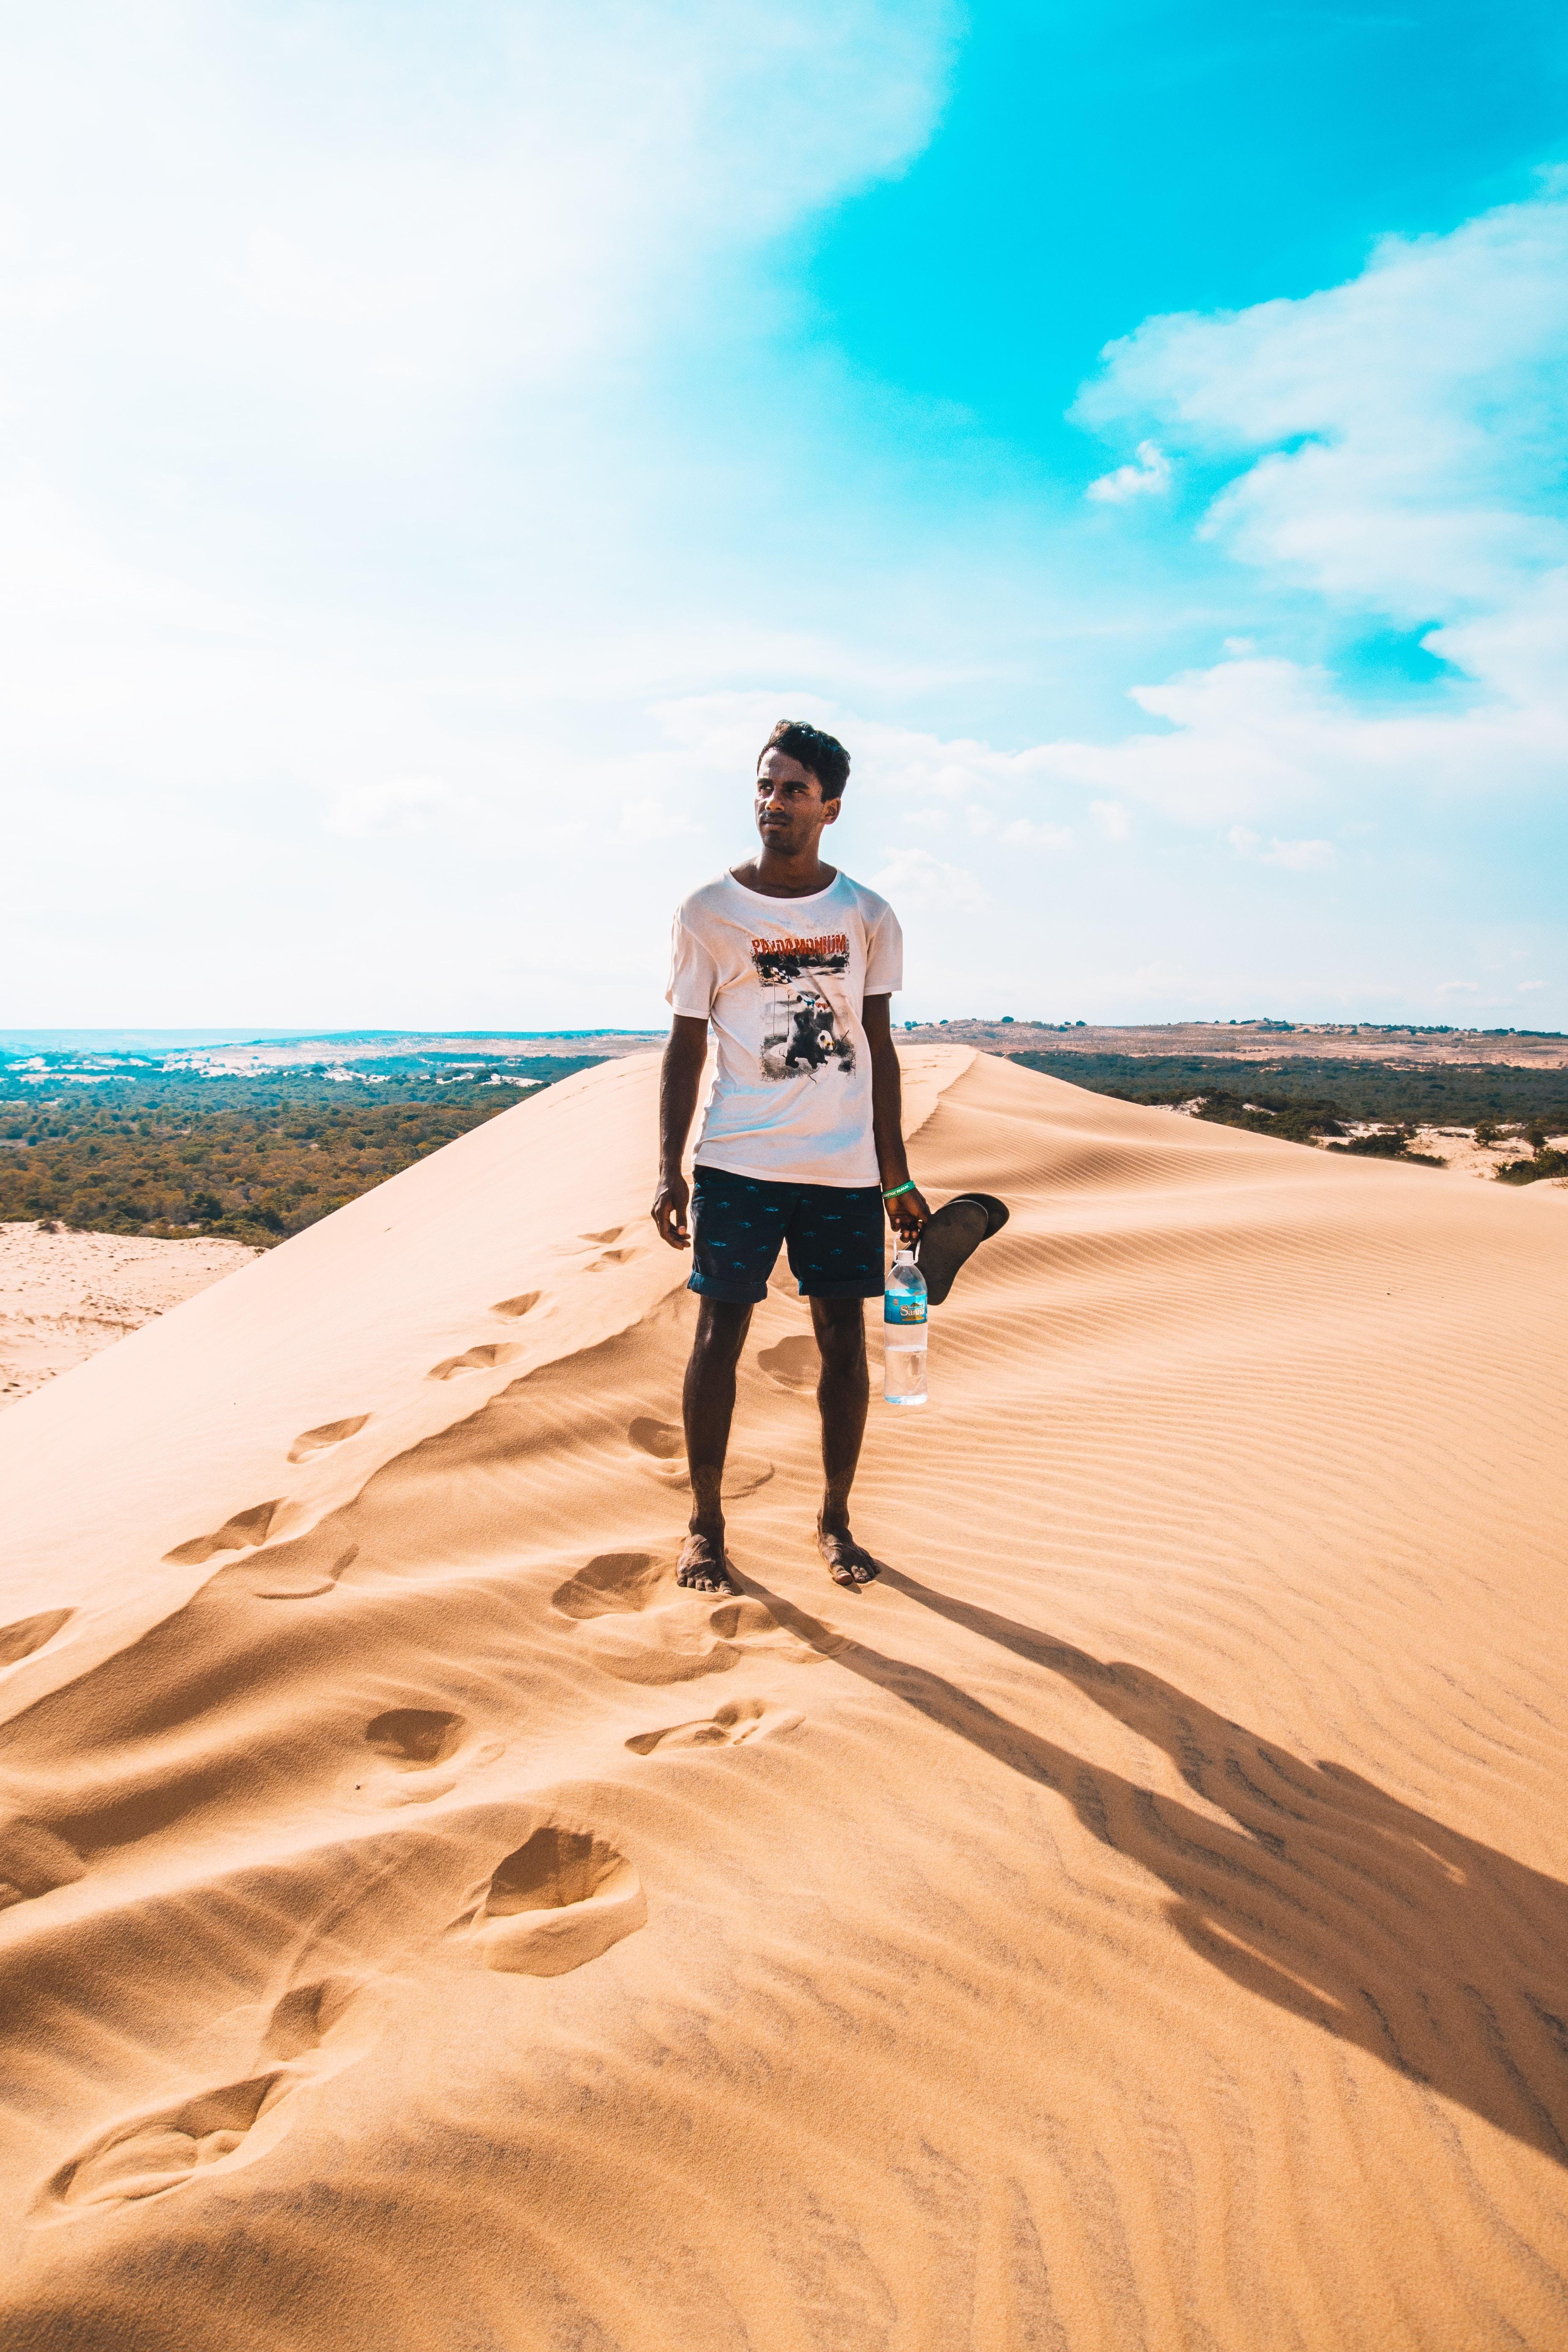 man standing on desert mountain